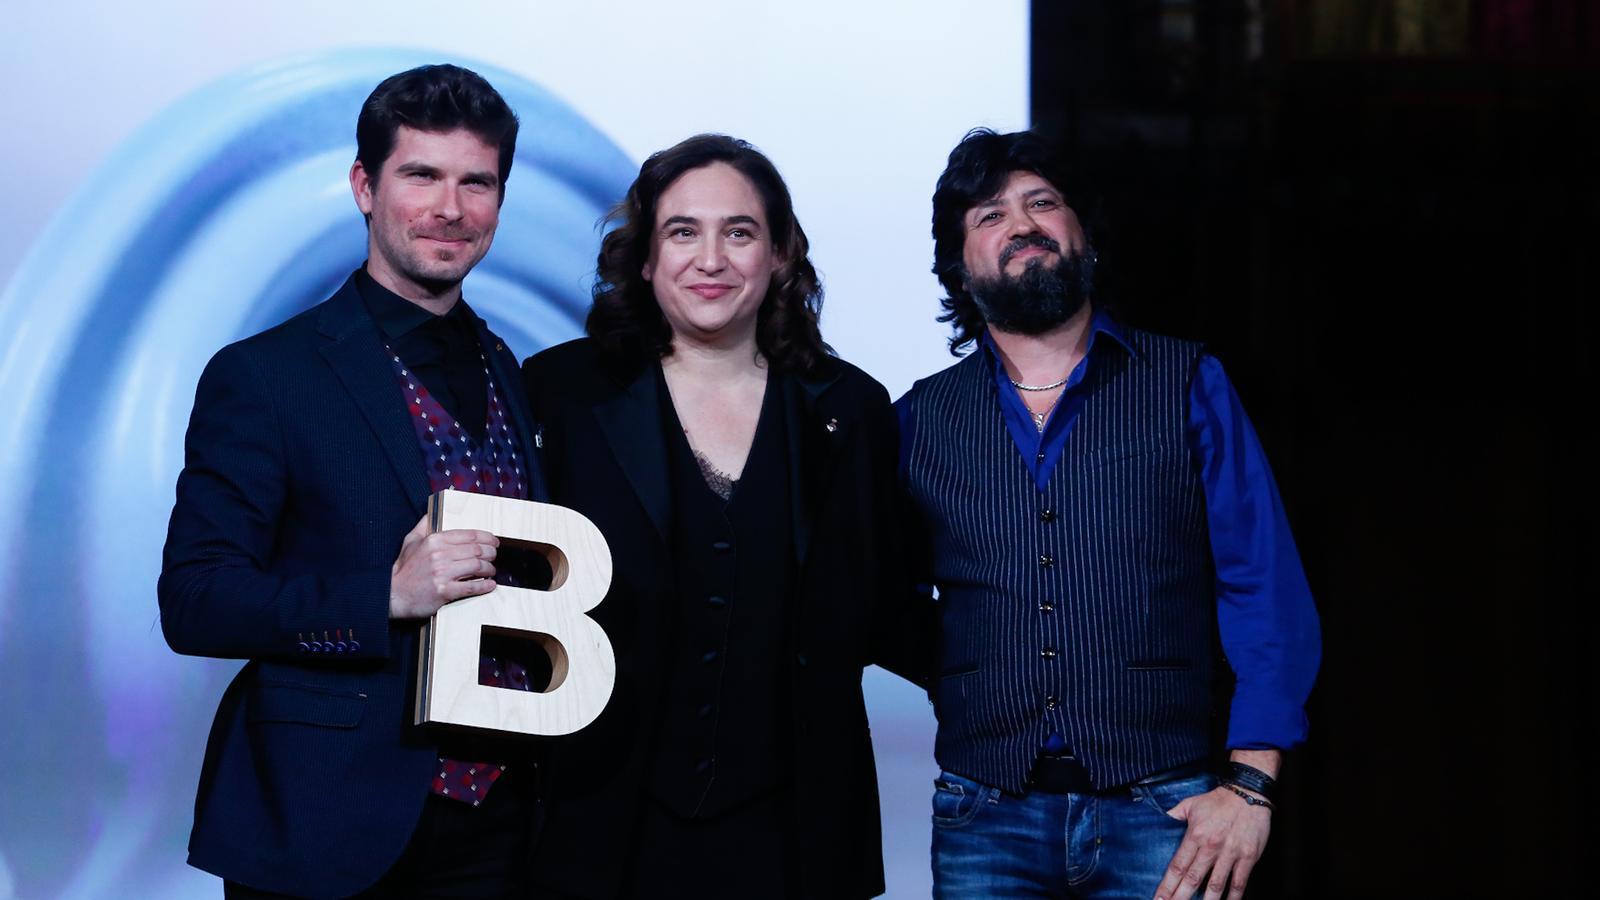 Marco Mezquida, Ada Colau i Chicuelo als Premis Ciutat de Barcelona